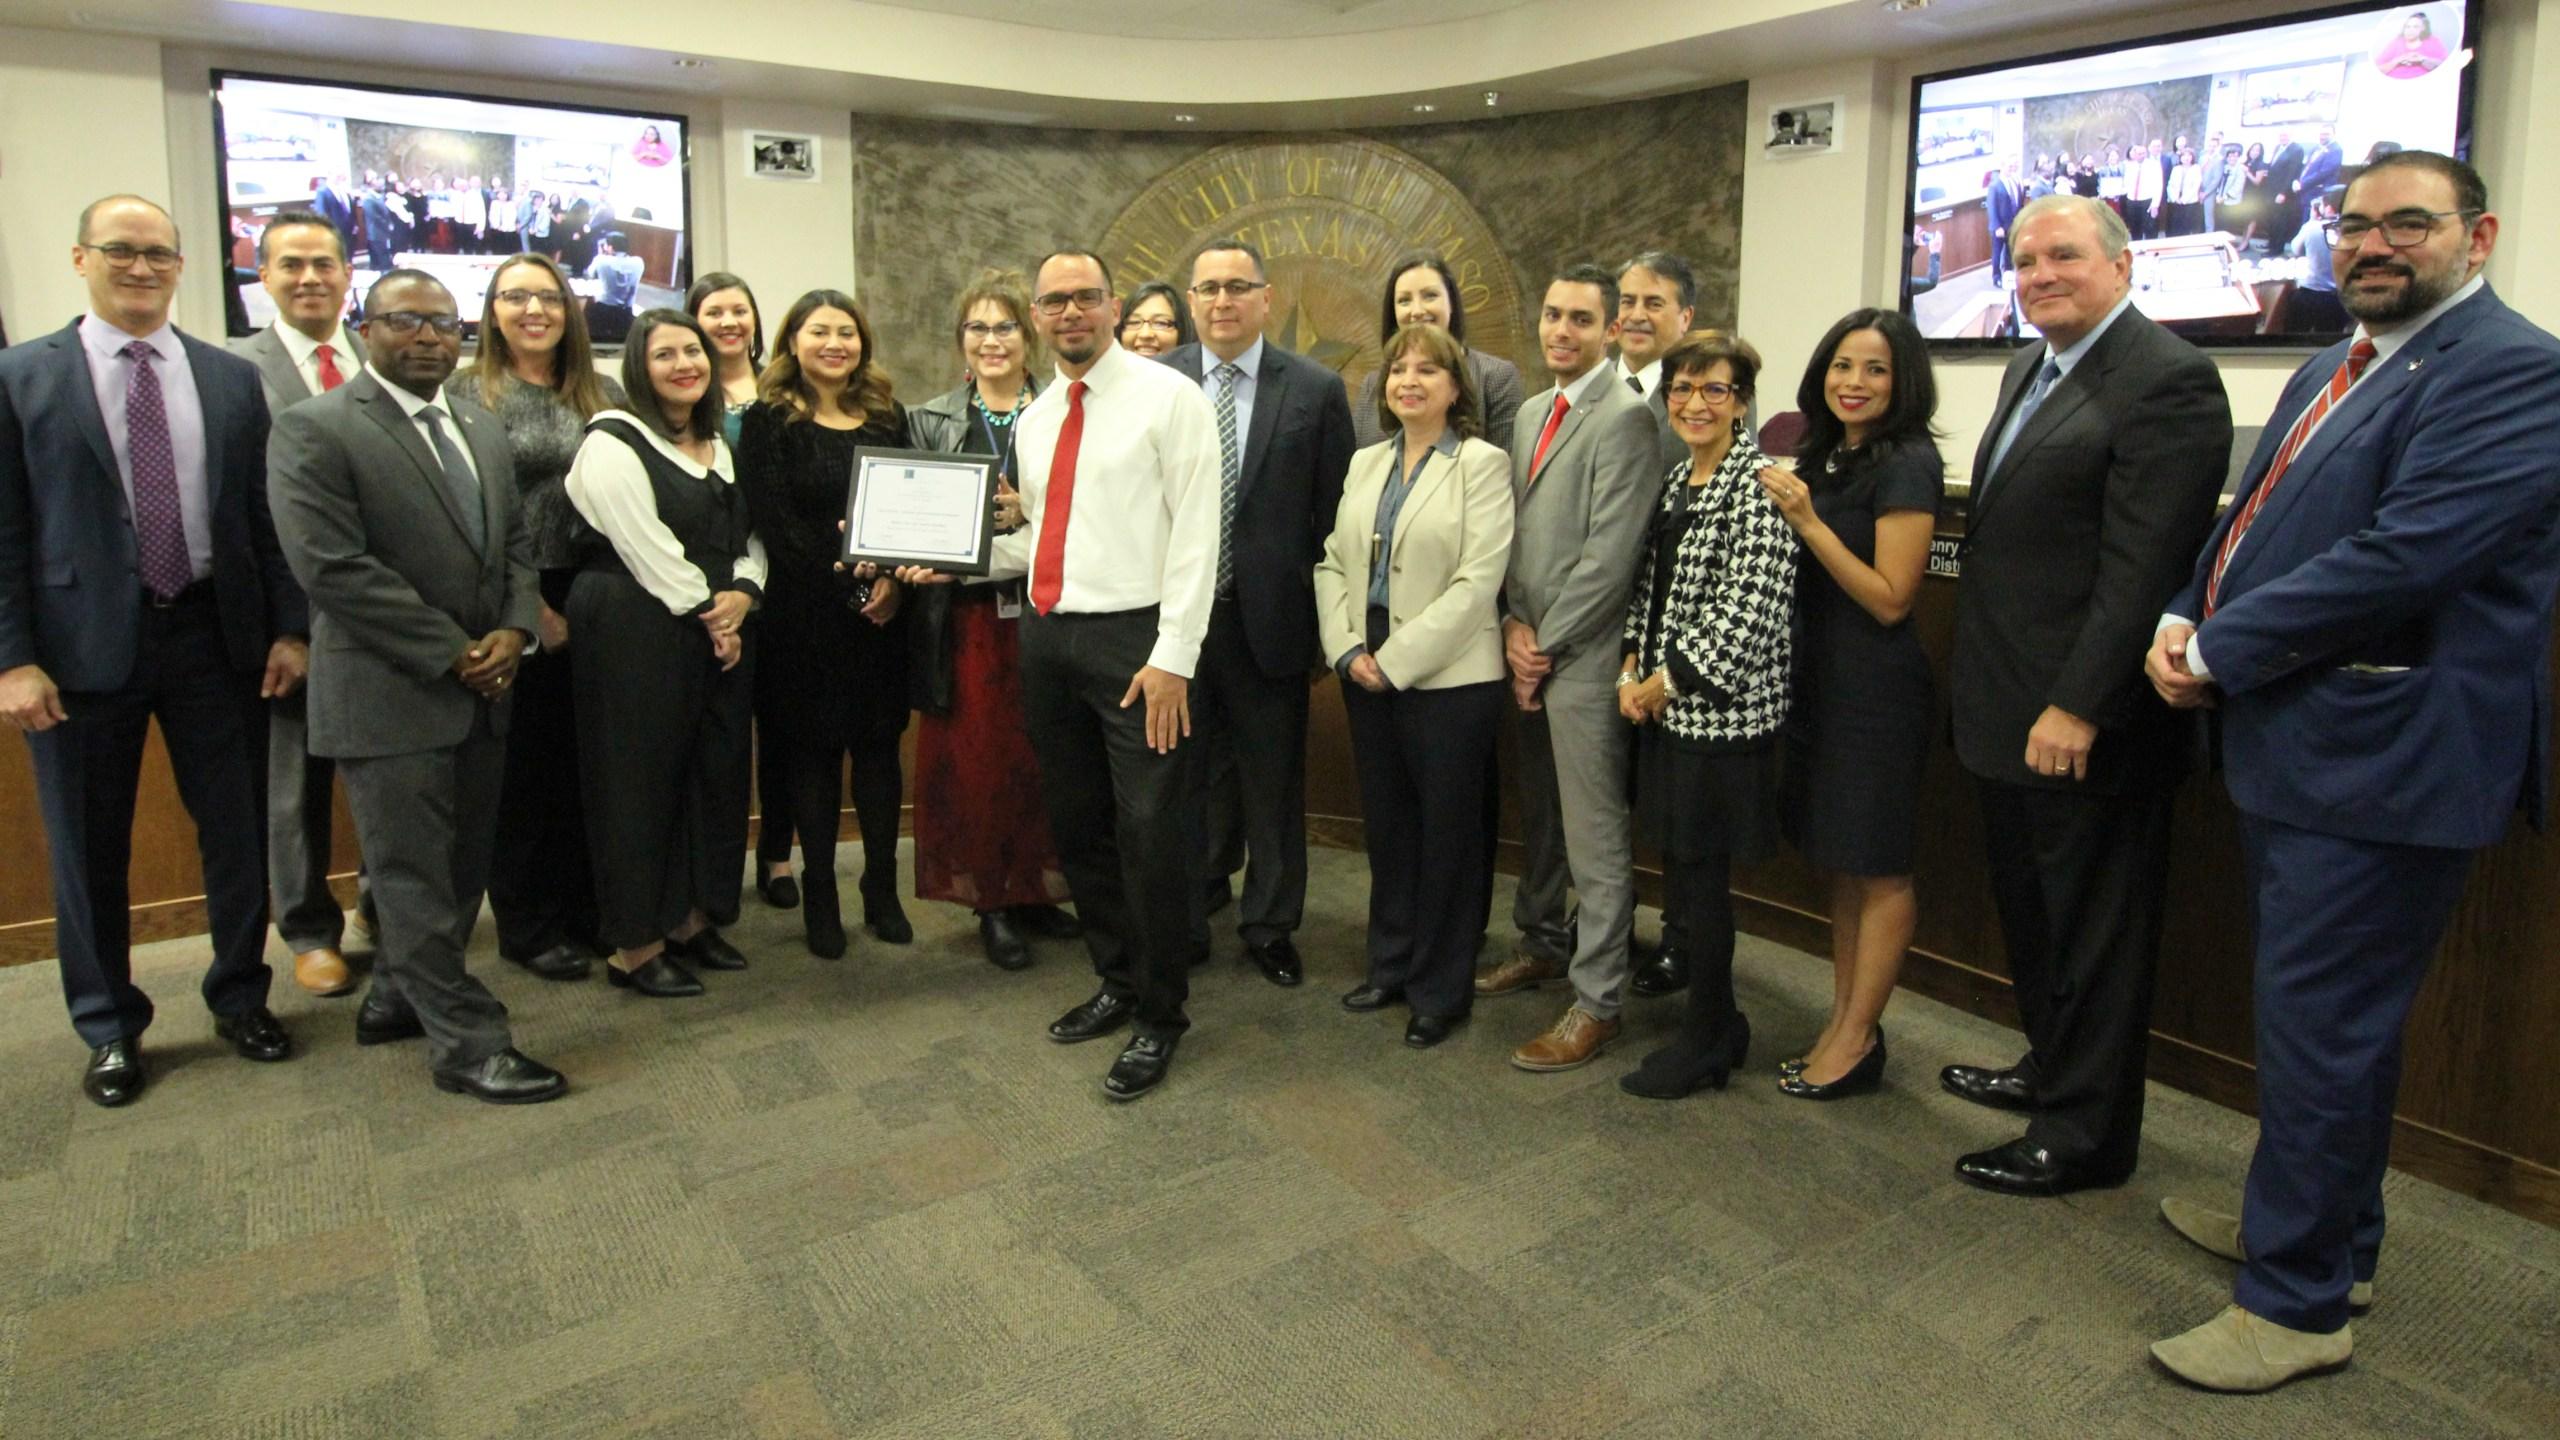 Recognitions by Mayor - 2018 International Economic Dev. Silver Award_1539710876893.jpg.jpg